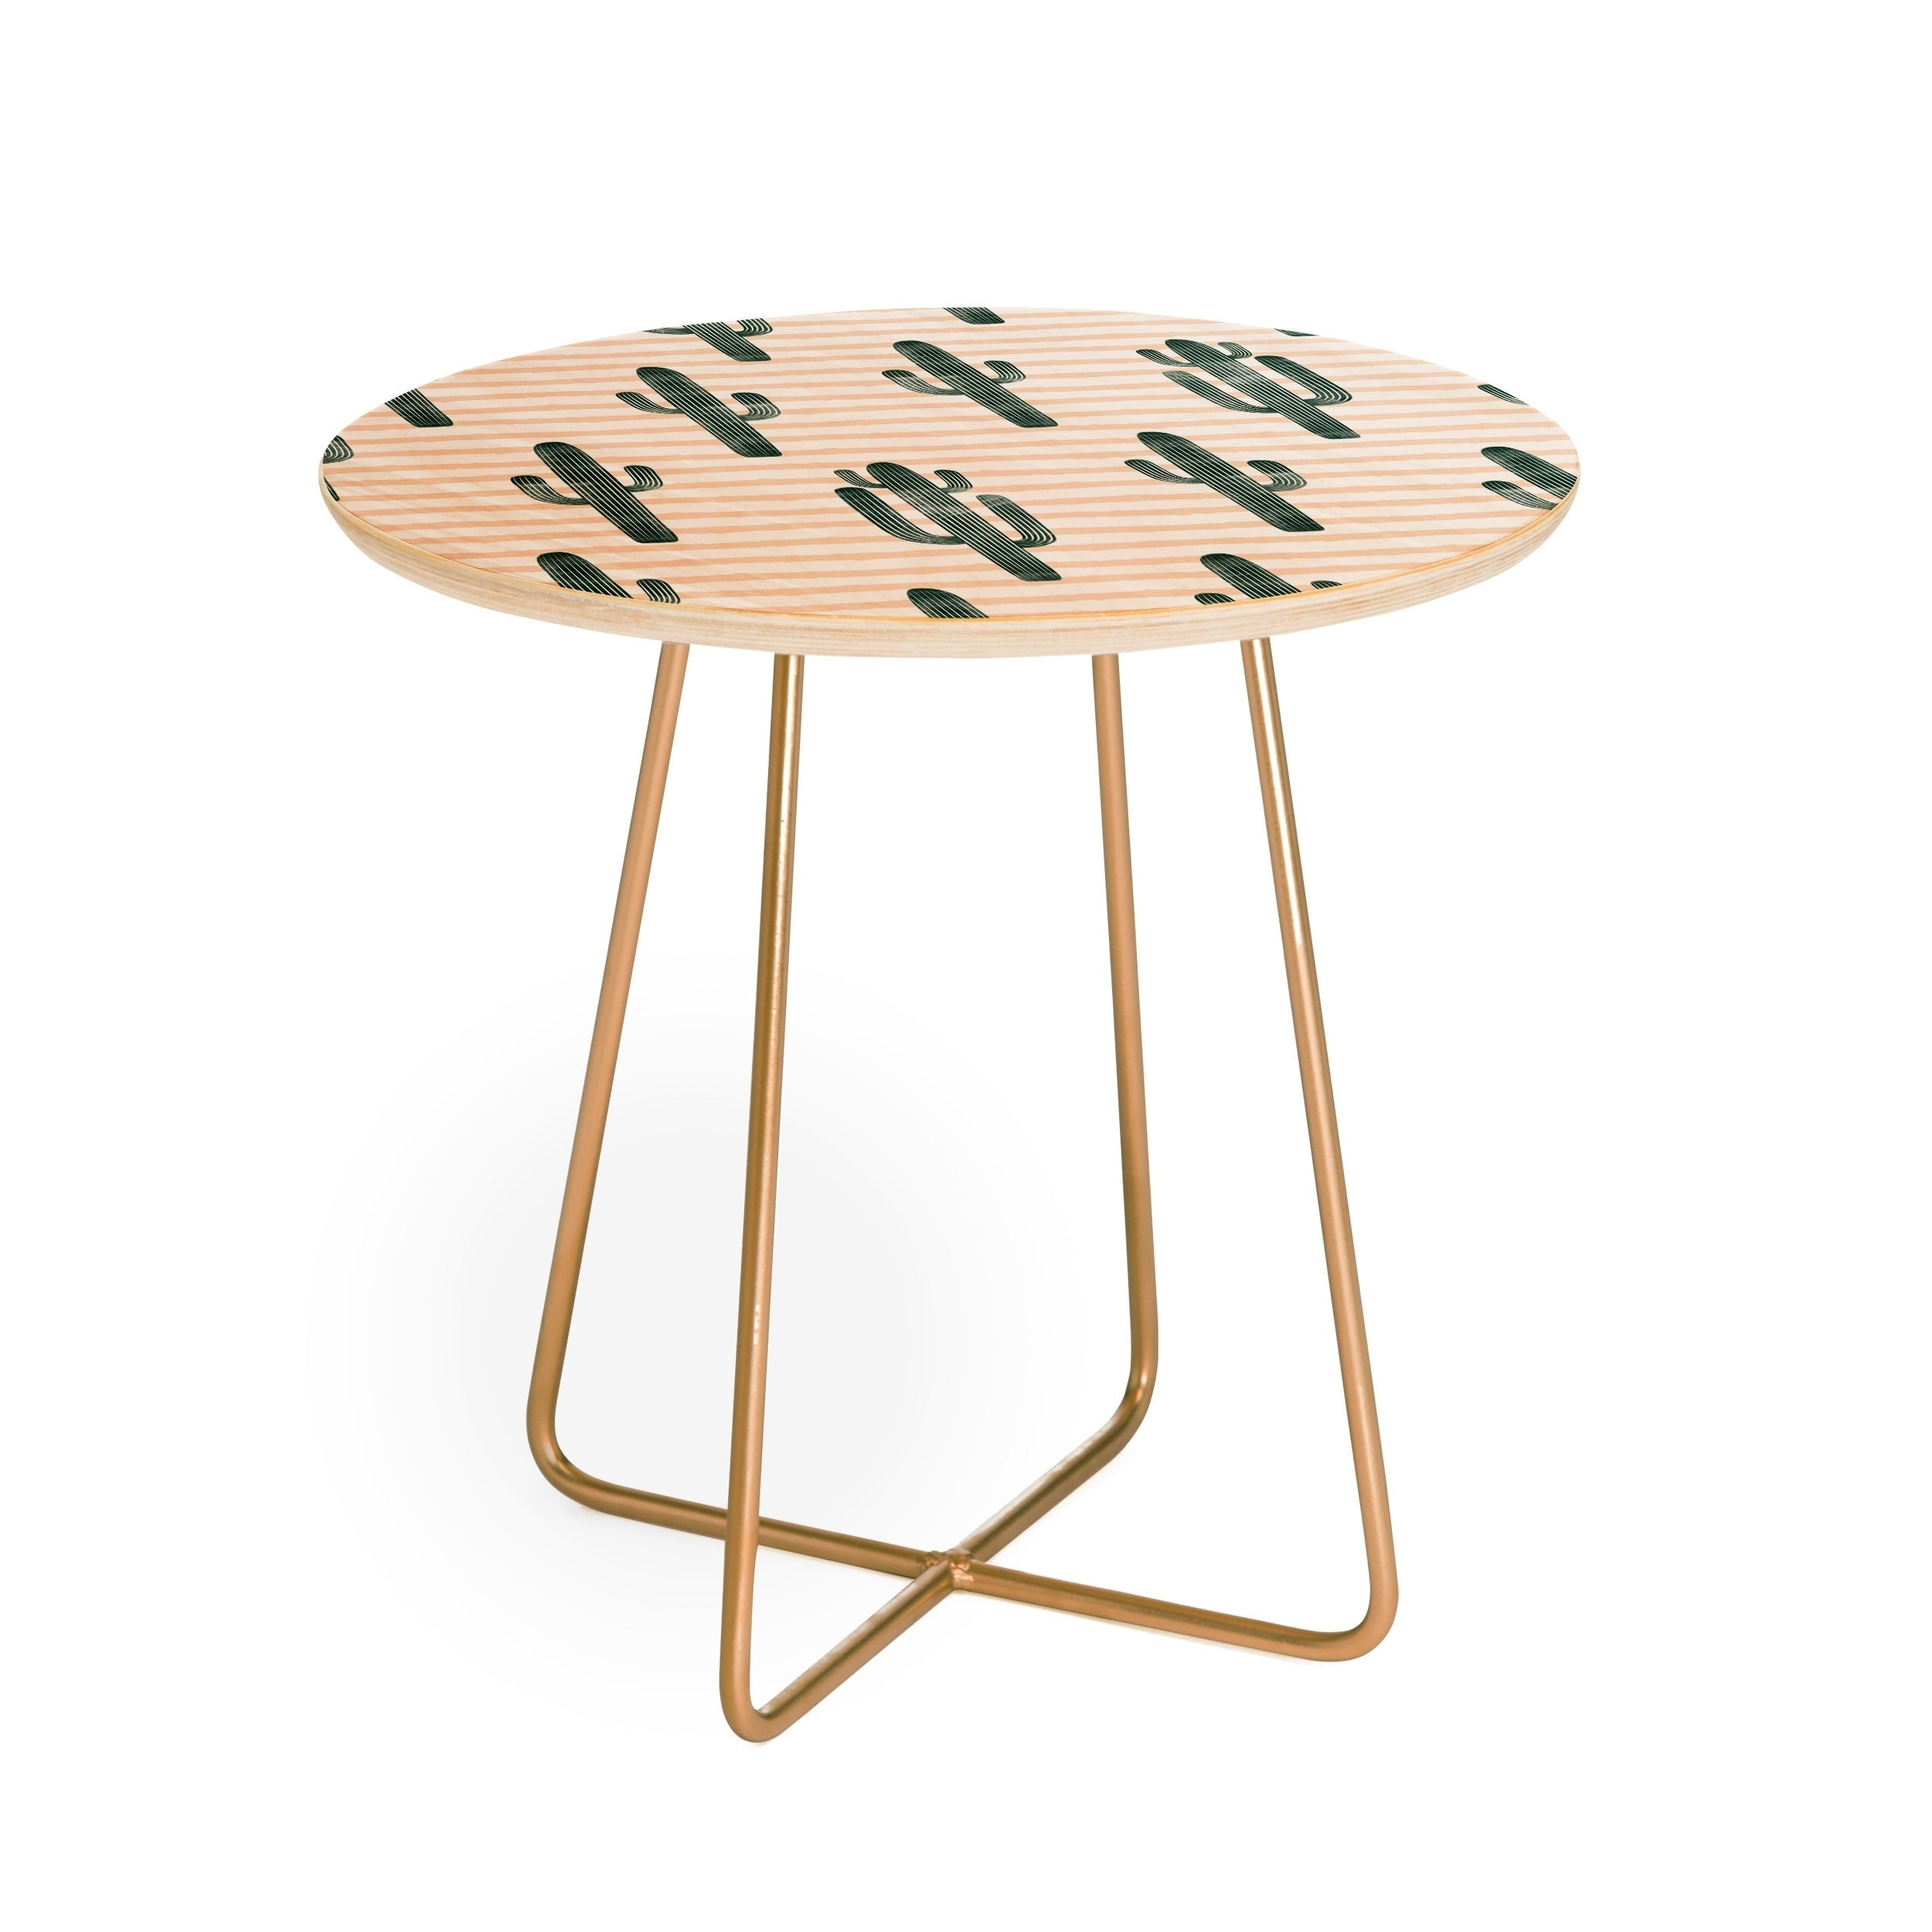 Little Arrow Design Co Modern Jungle Cactus Round Side Table